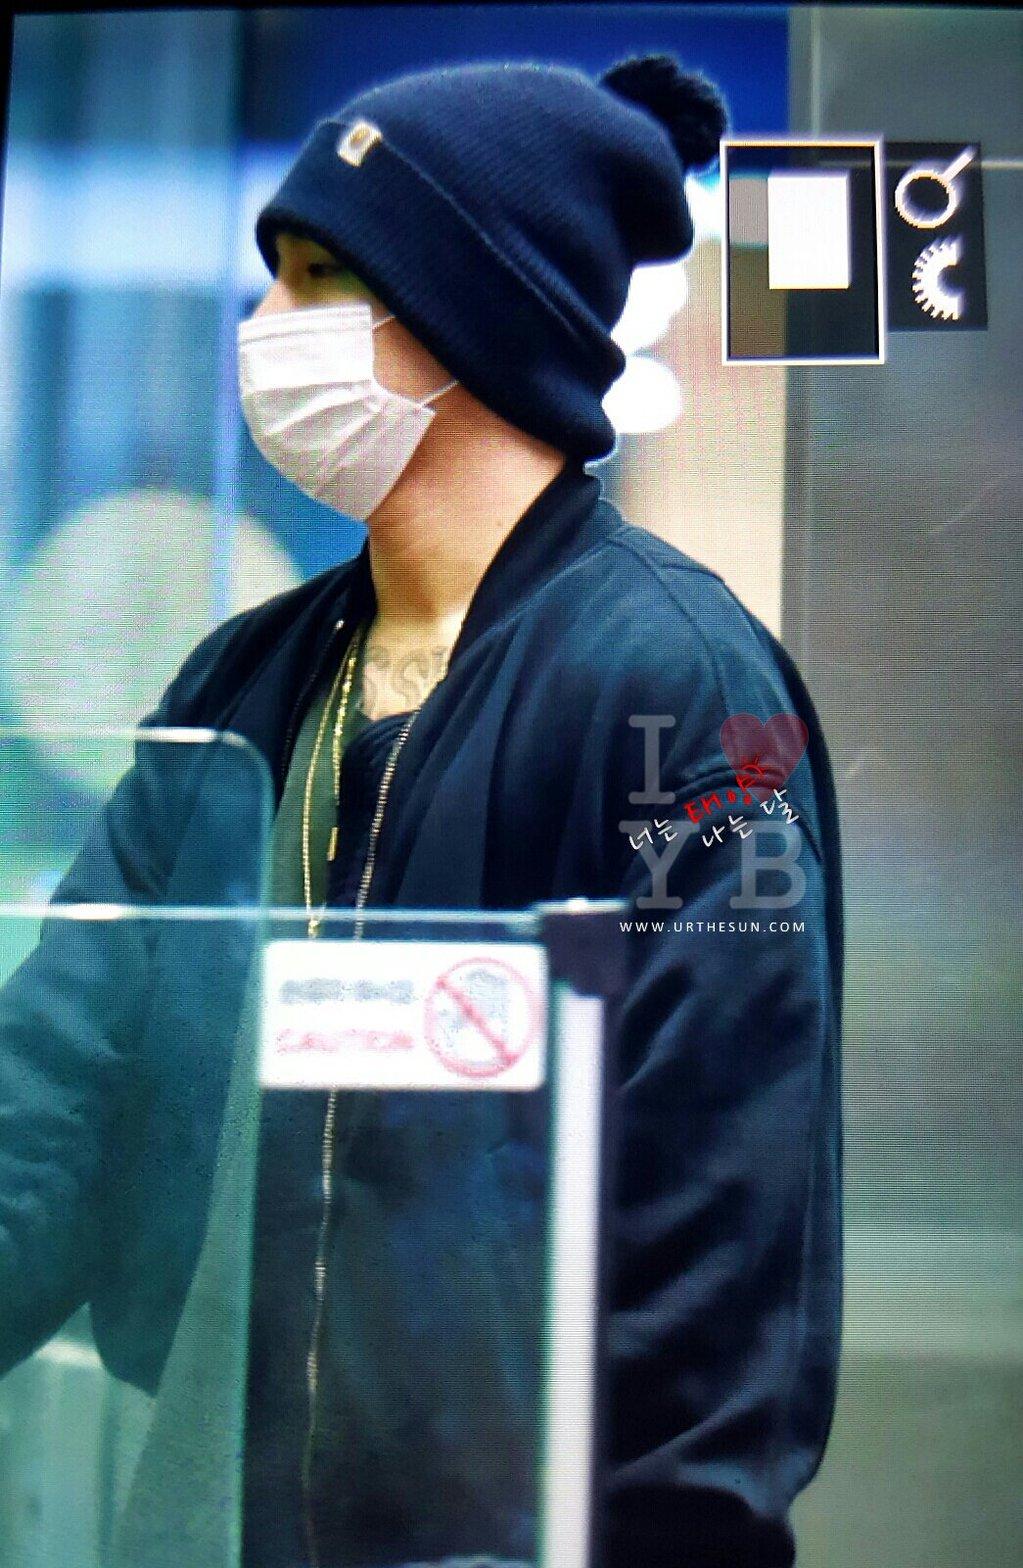 BIGBANG arrival Seoul from Hong Kong 2015-12-03 urthesun (1)